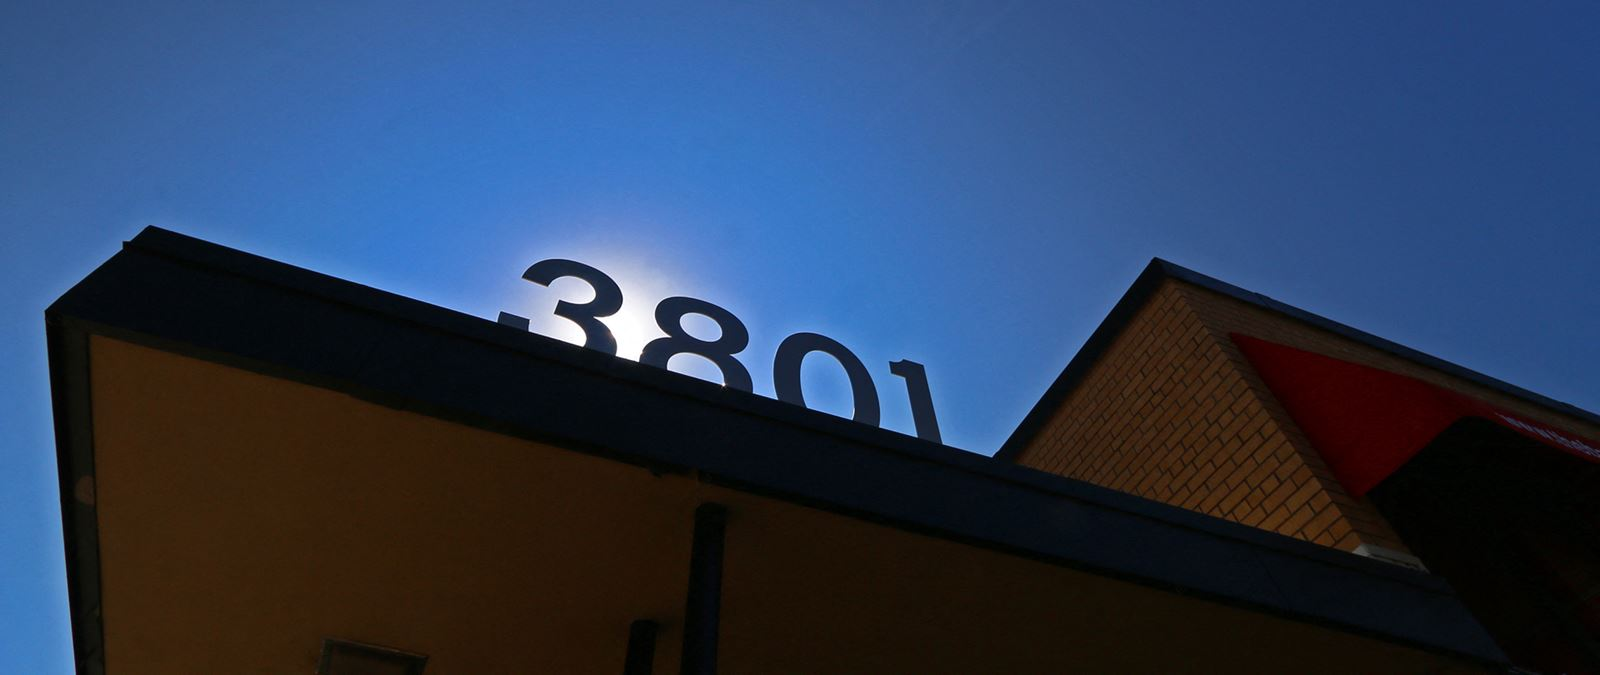 3801 West 50th Street